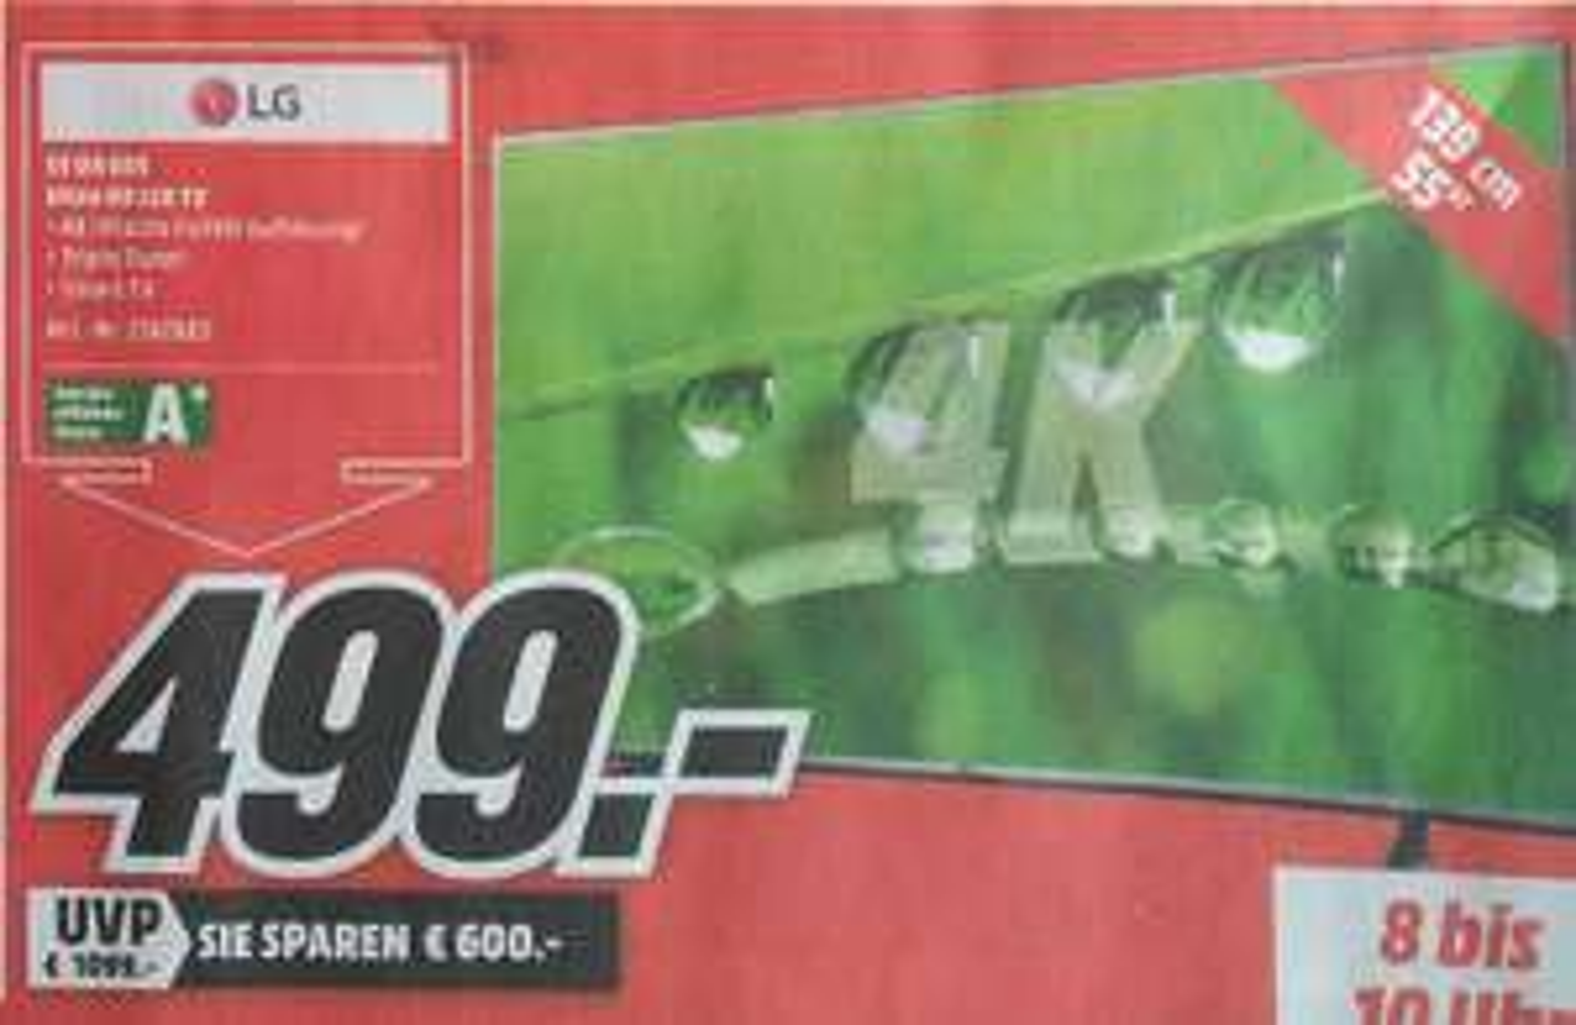 [Lokal Heilbronn Media Markt 13.05. 8-10 Uhr] LG 55UH605 UHD LED TV für 499€ (Vgp: 619€), Philips FC8577/09 Performer Bodenstaubsauger für 77€ (Vgp: 170€)